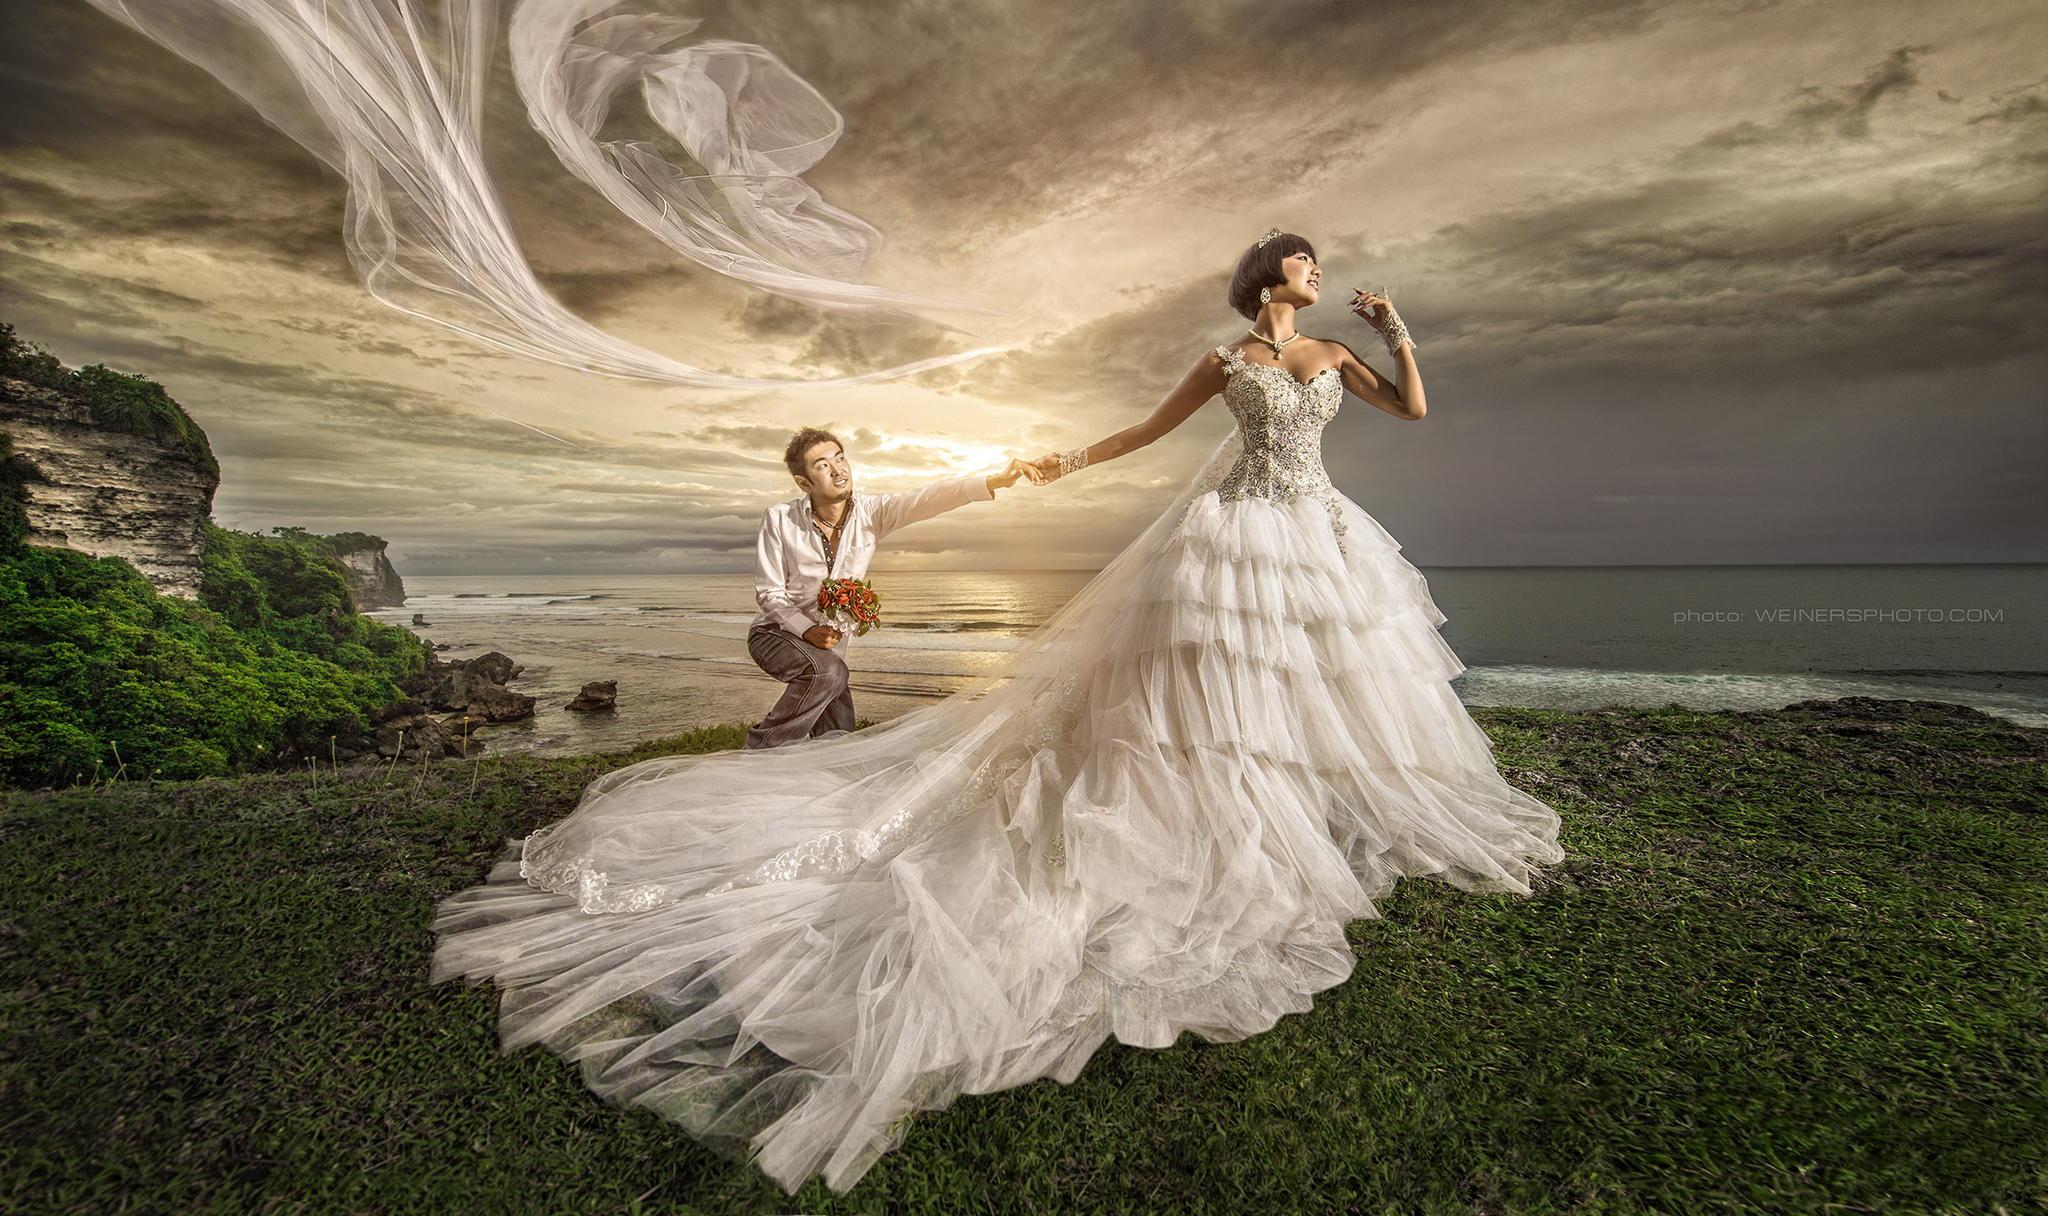 30 Creative Wedding Photography Ideas